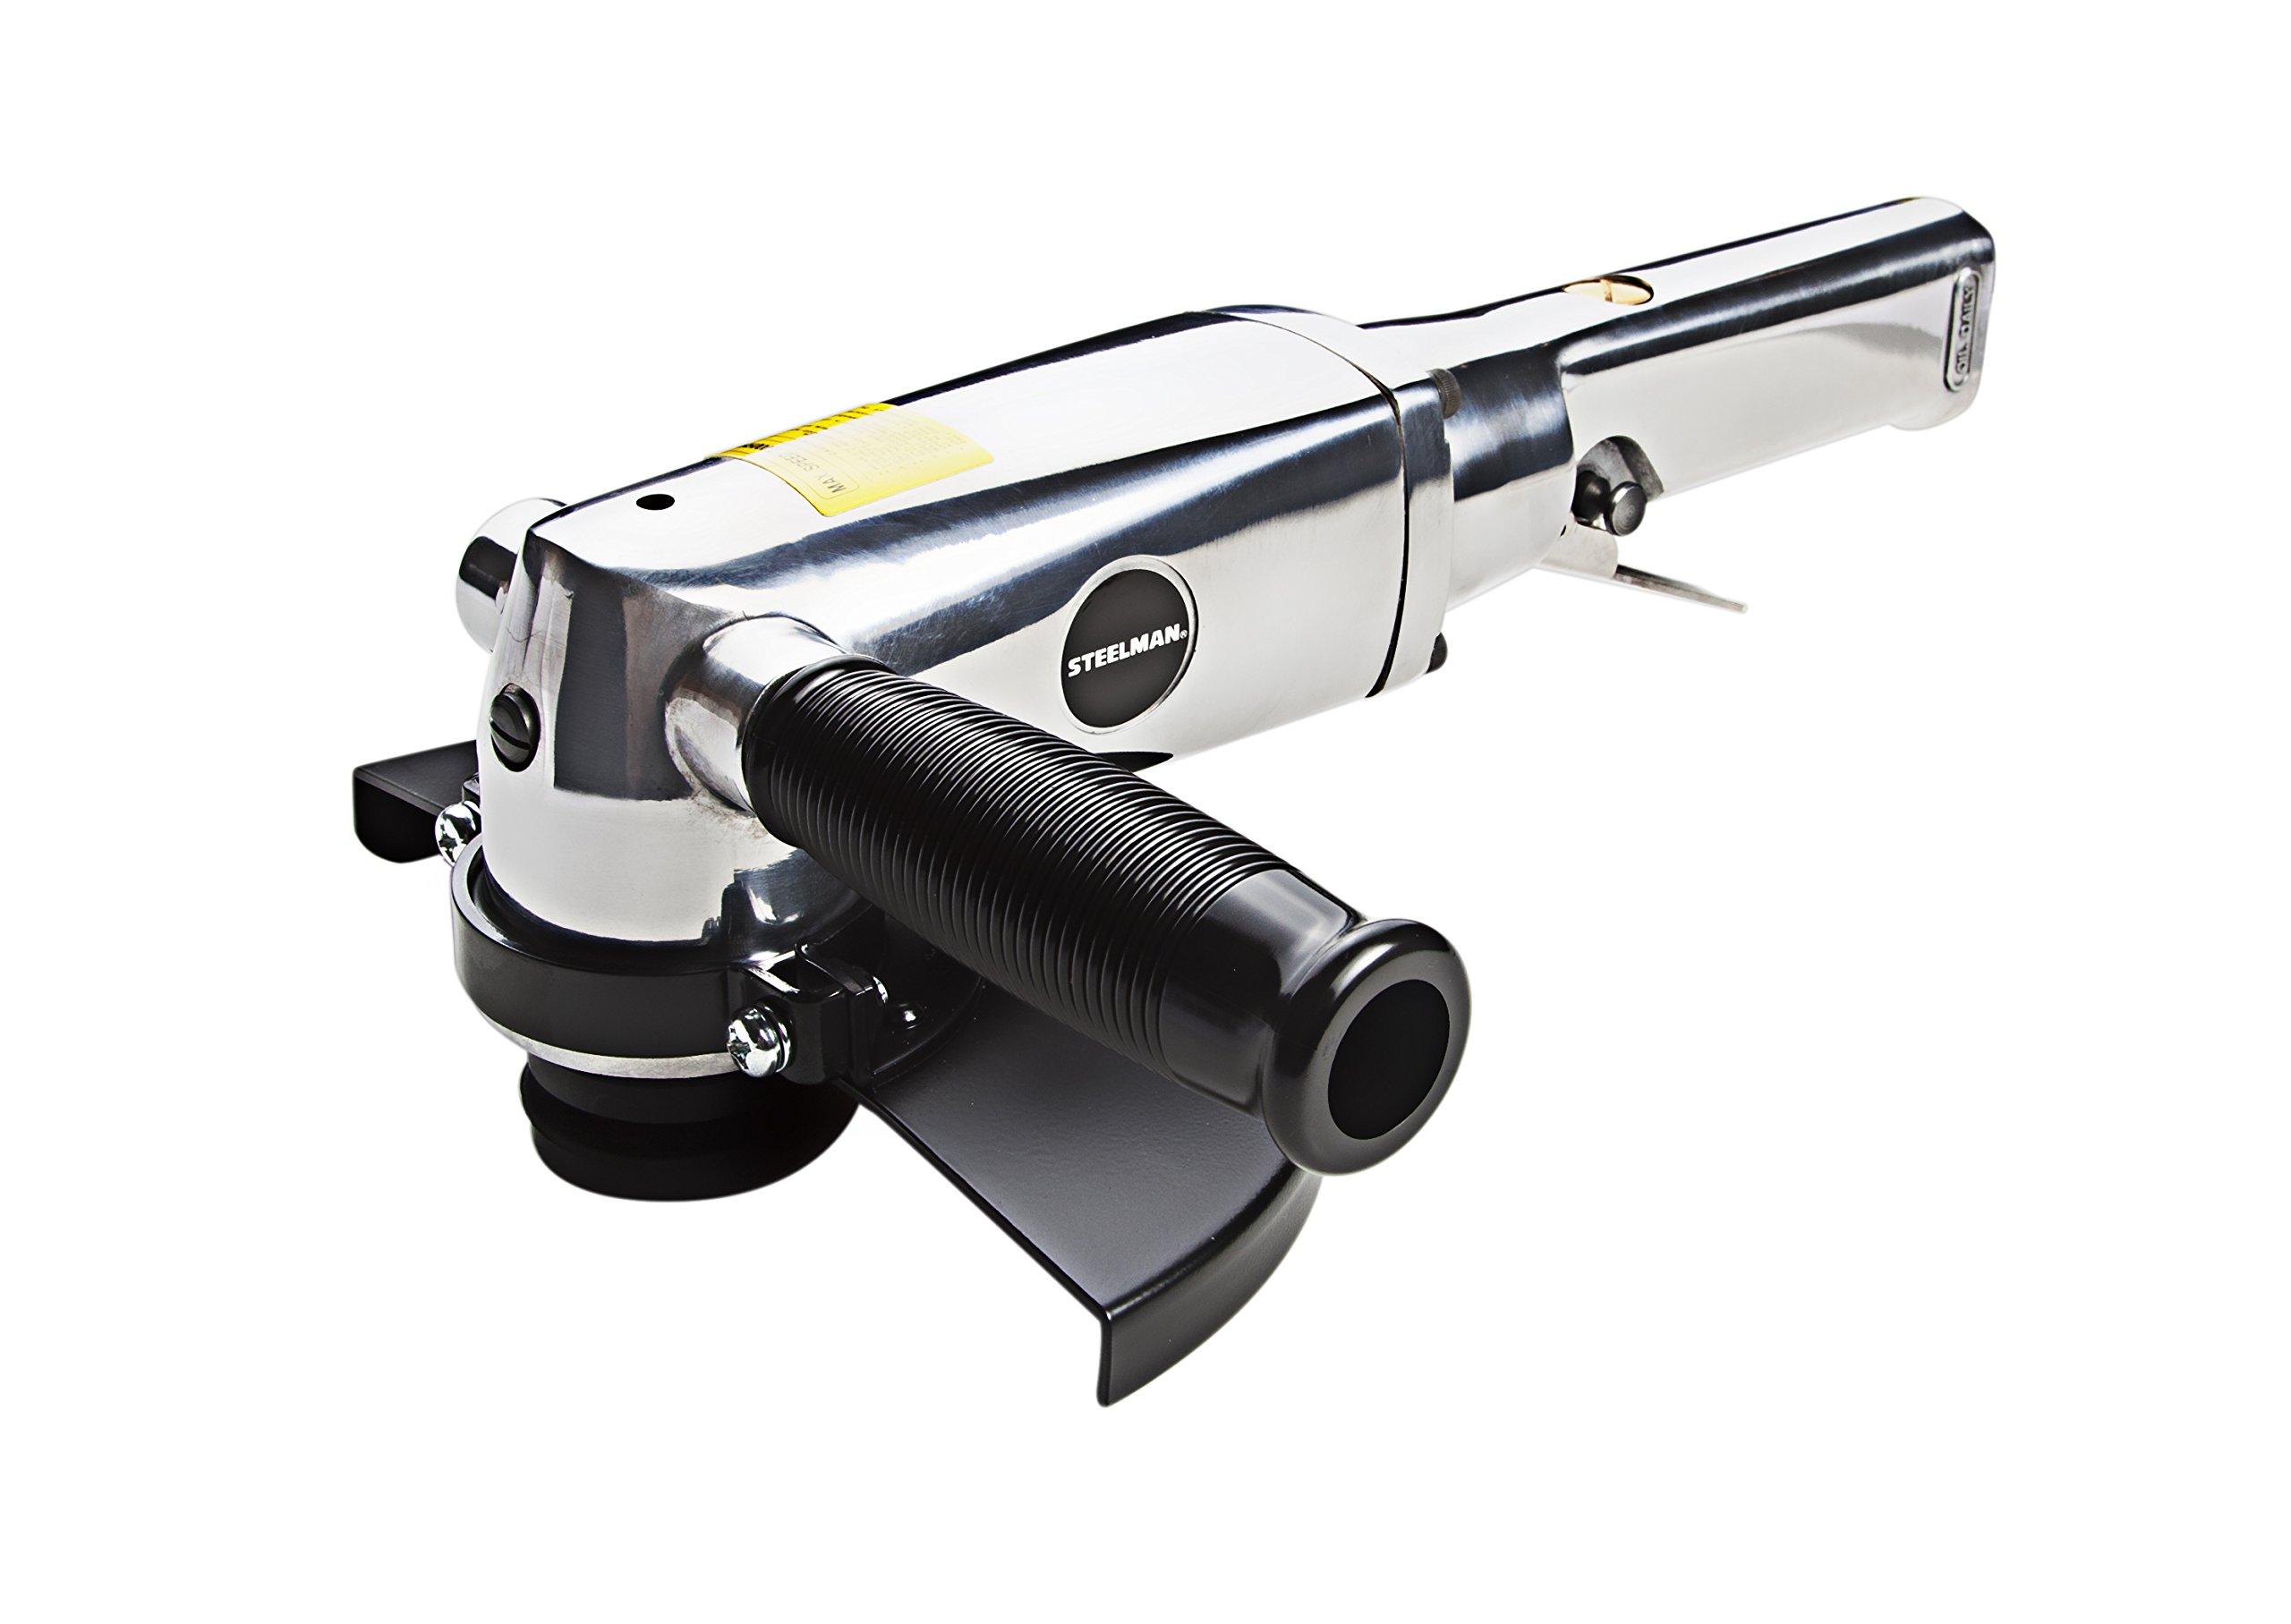 Steelman 2522 7-Inch Angle Grinder